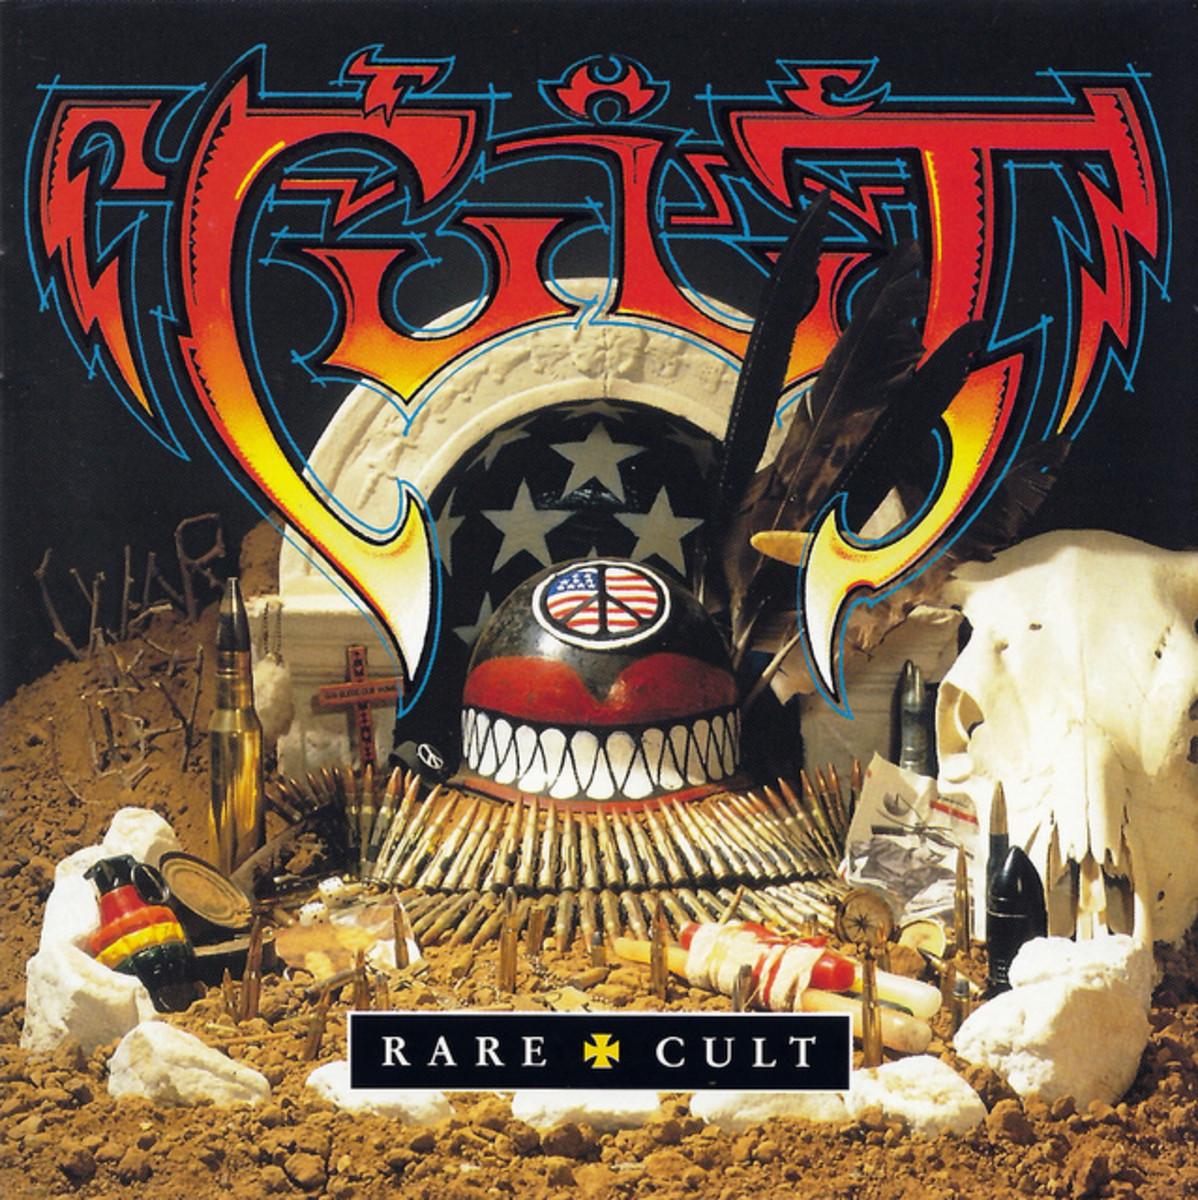 "The Cult ""Best Of Rare Cult"" Beggars Banquet US BBL 2029 CD Album US Pressing (2000) CD Album Cover Art Rick Griffin"